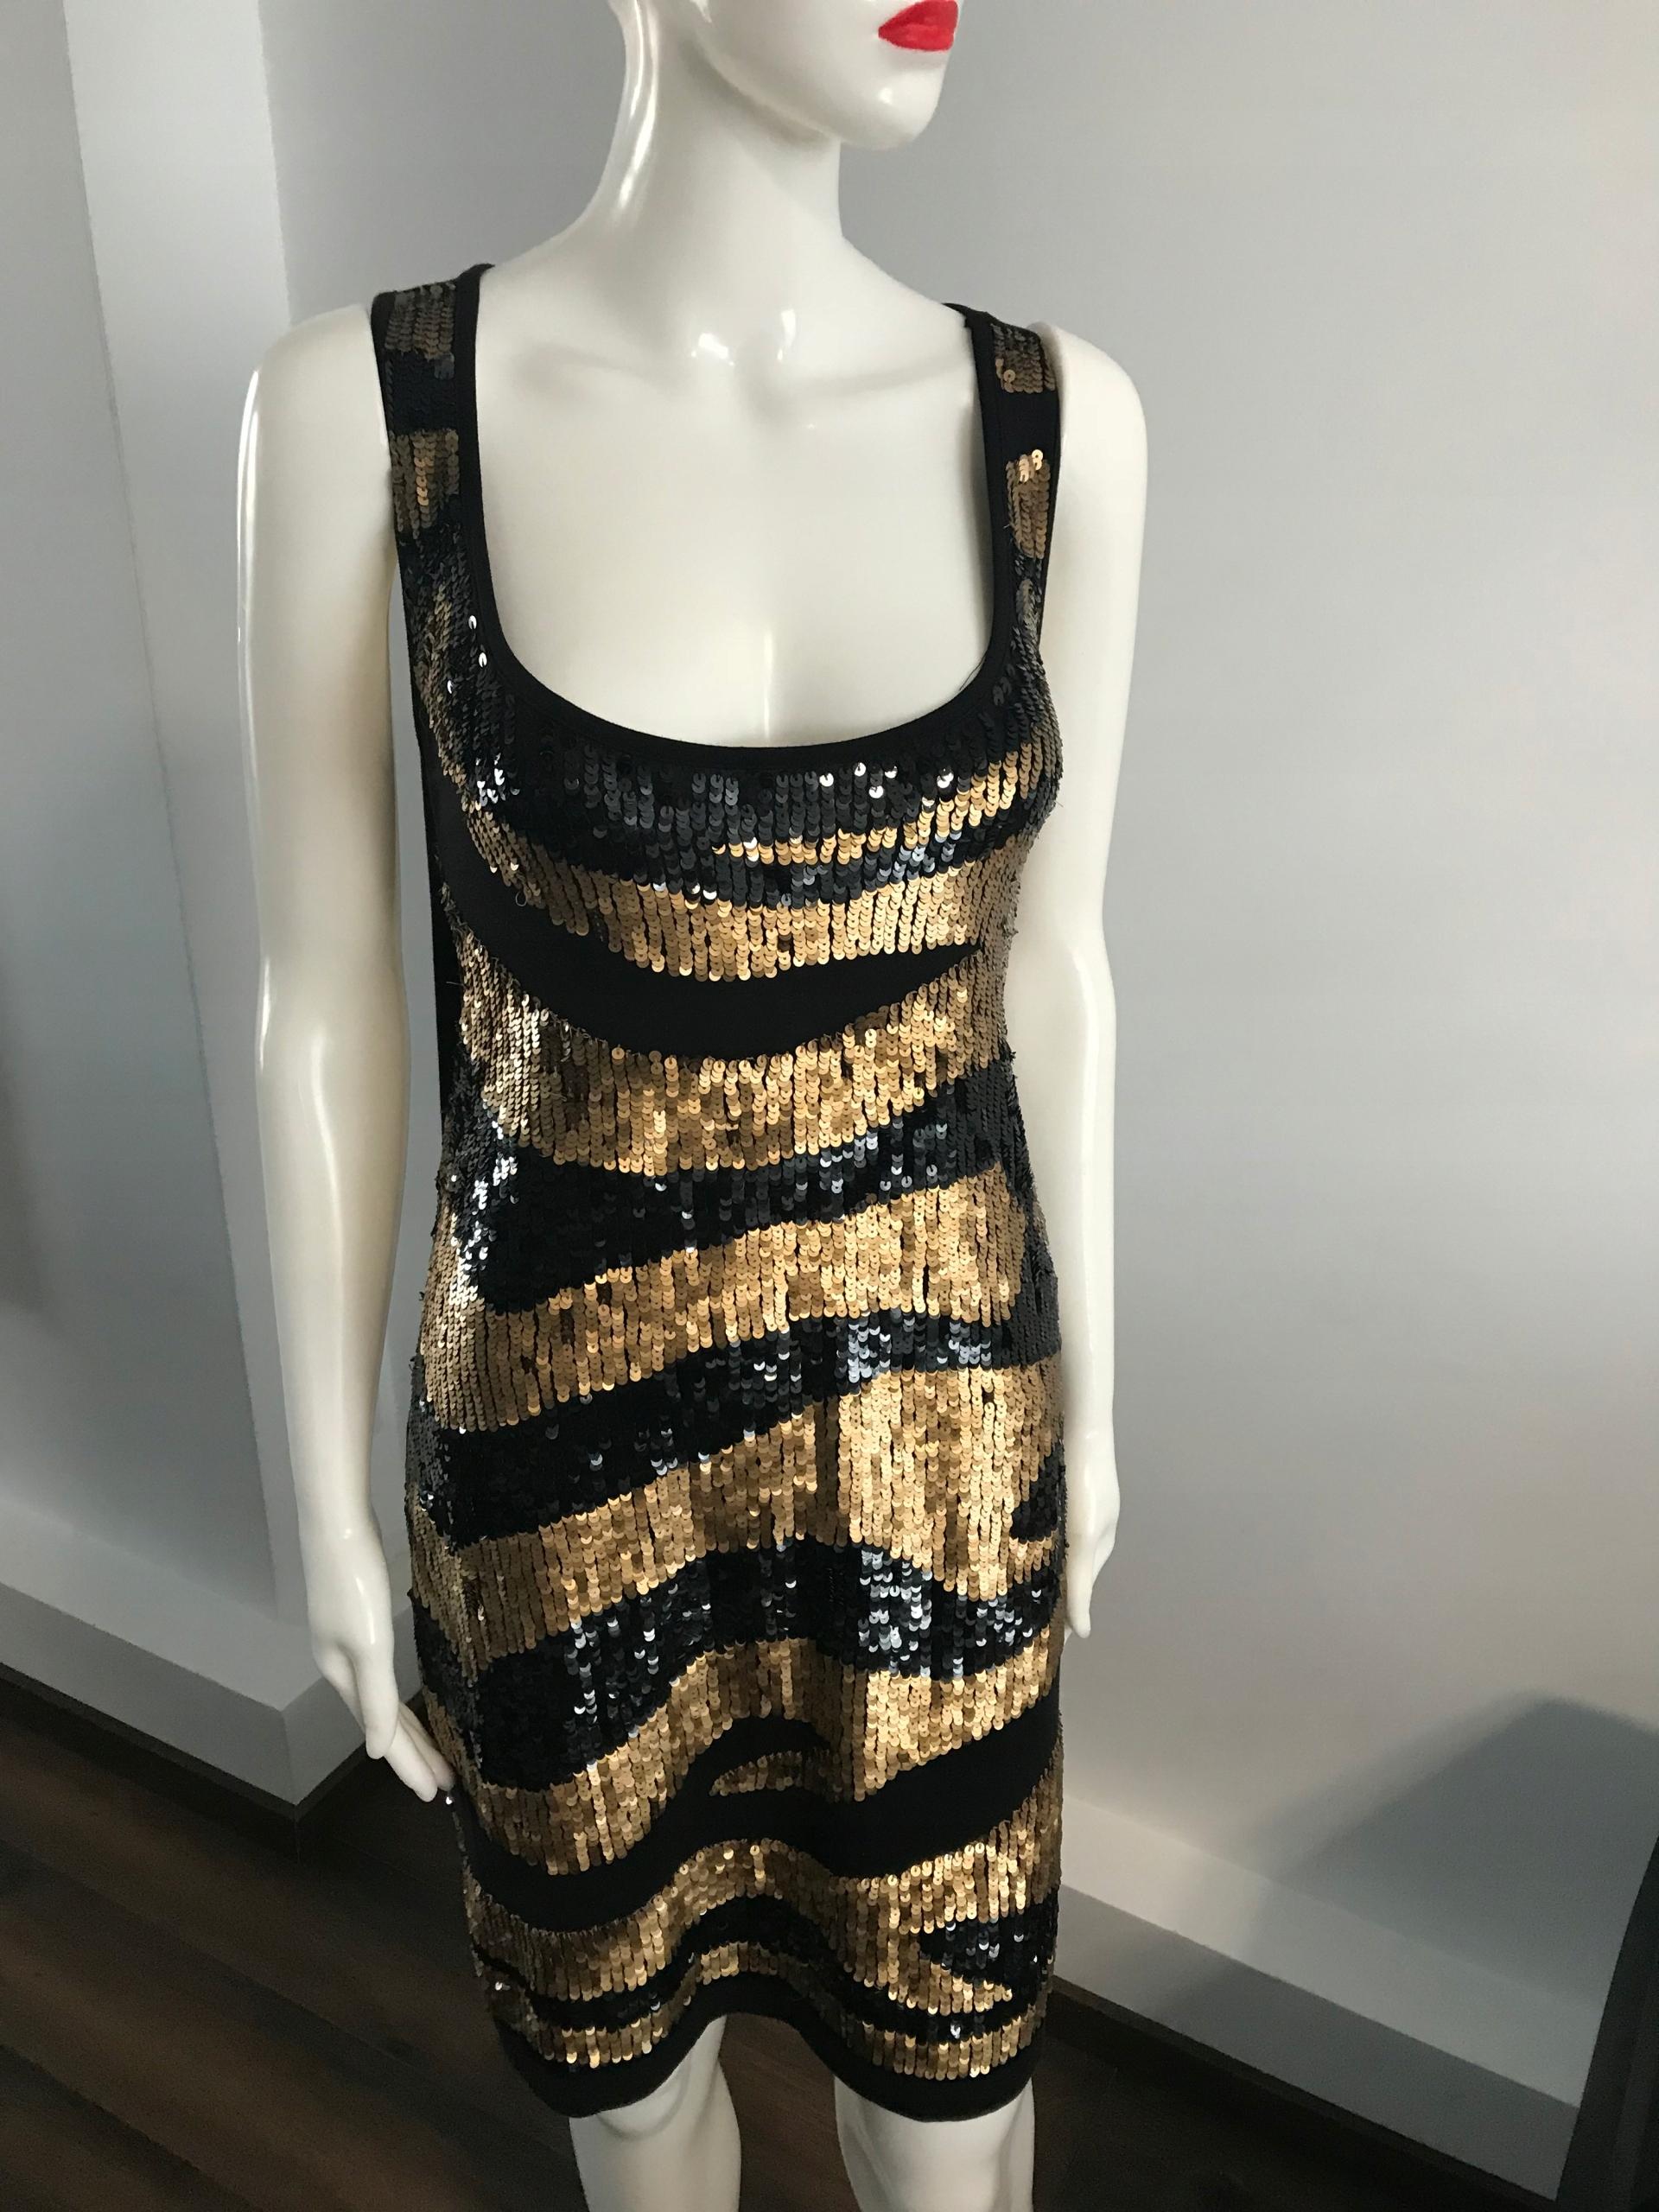 7b2df6f6da sukienka Next cekiny Zlote bokserka 40 sylwester - 7709121836 ...